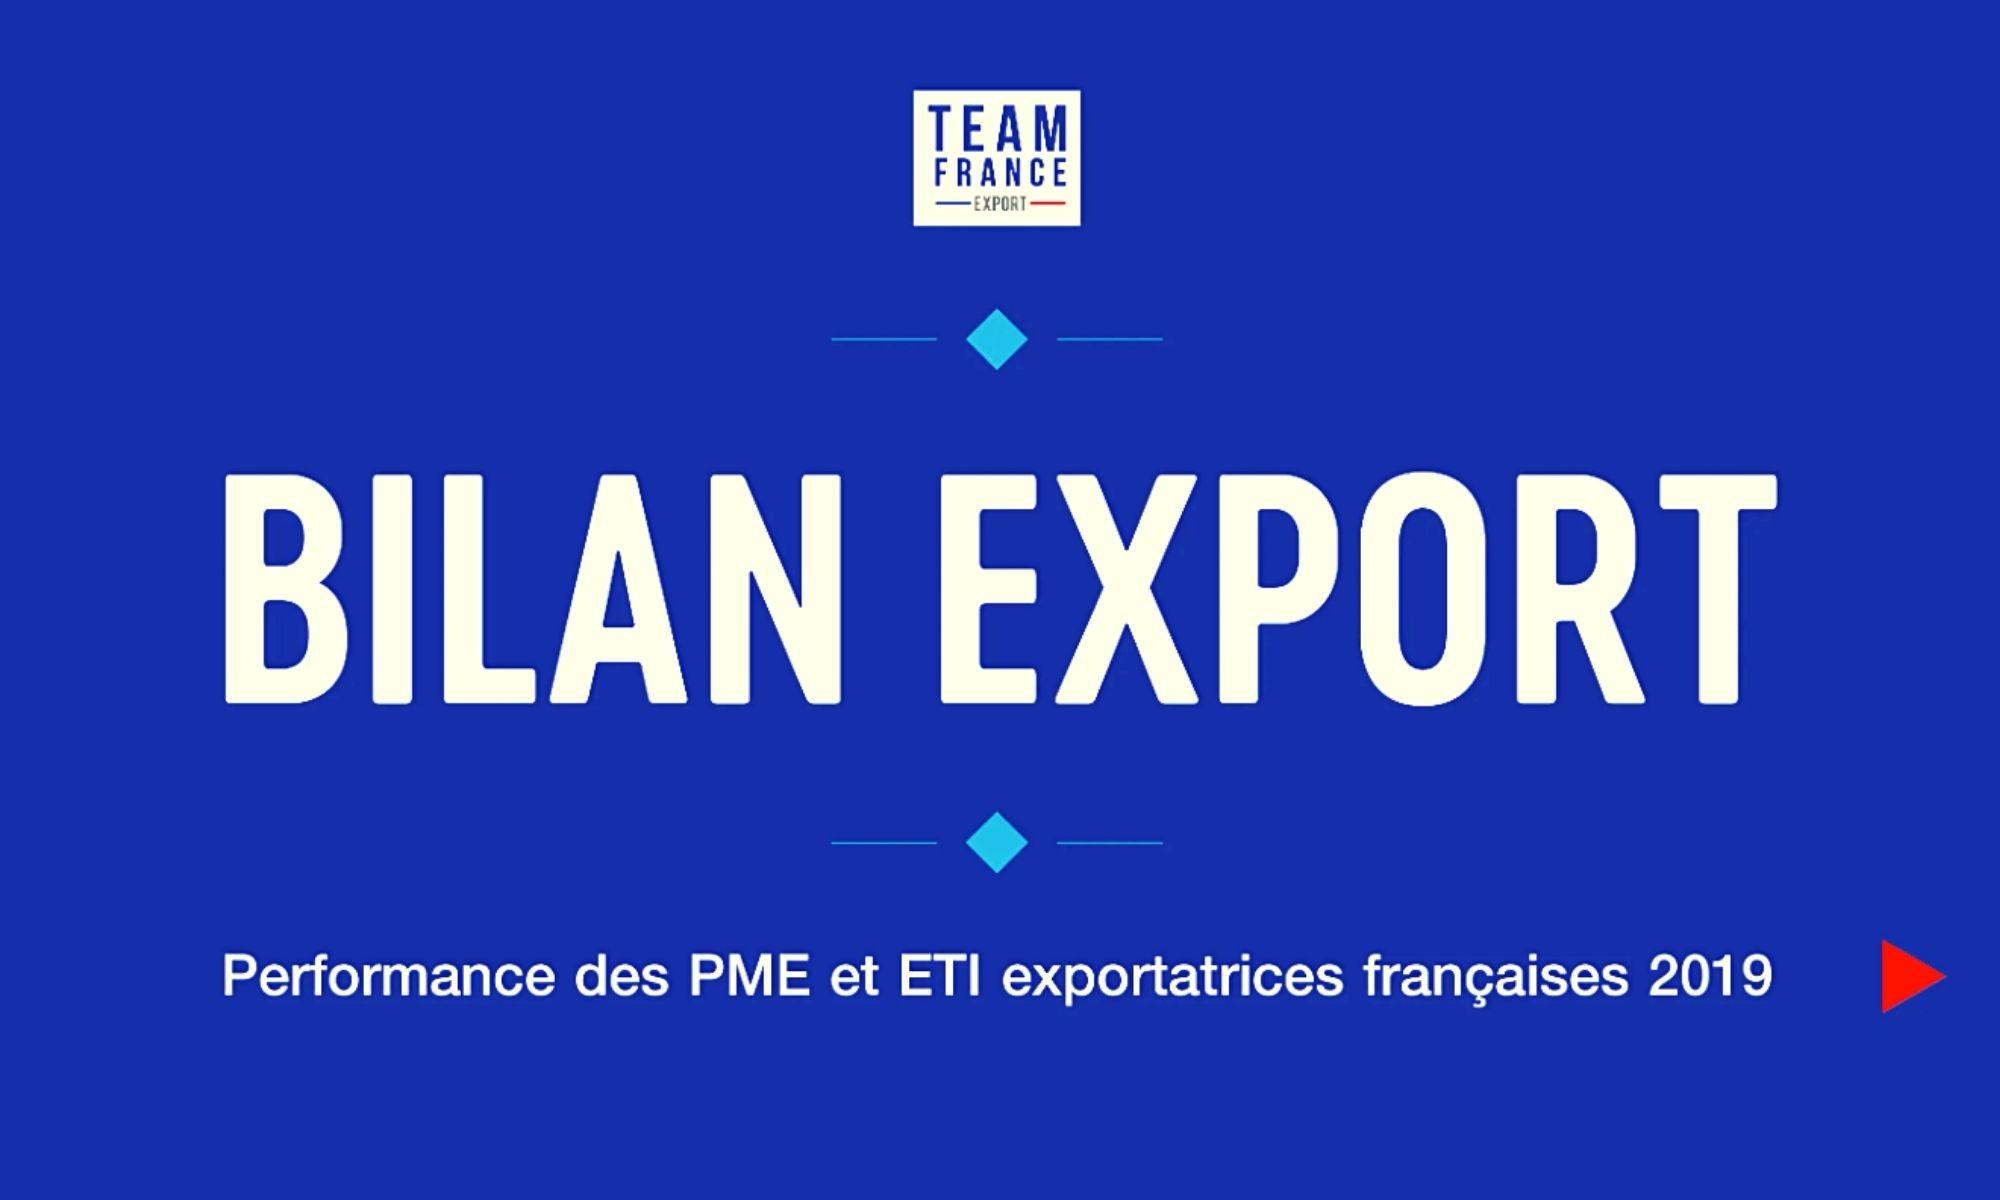 Bilan export 2020